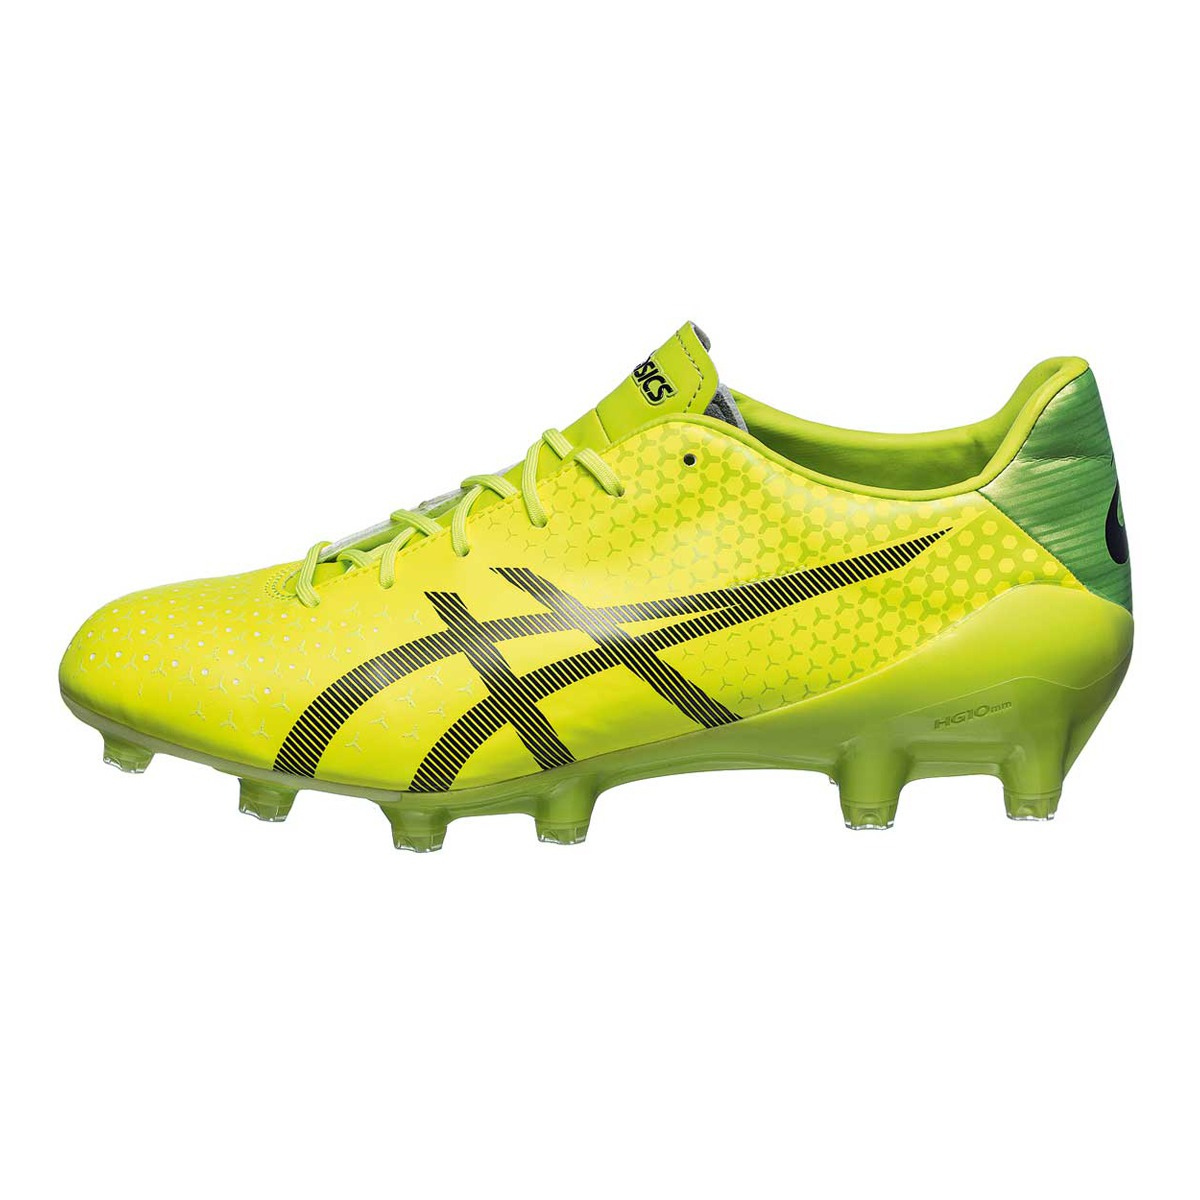 asics football boots asics gel-menace menu0027s football boots GDFOCMH